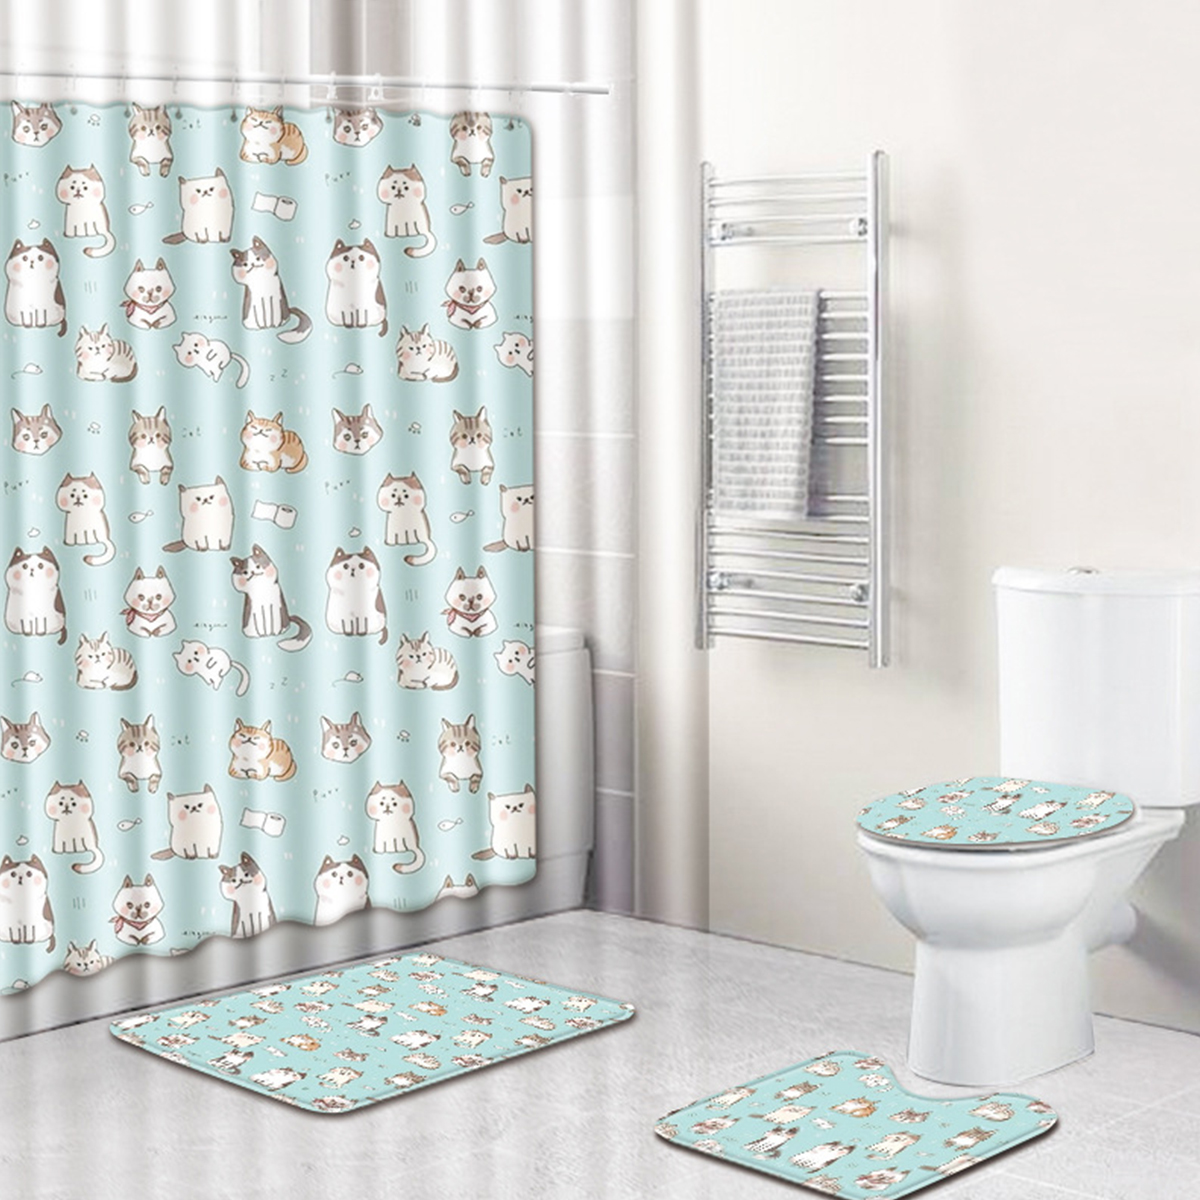 4Pcs//Set Bathroom Polyester Shower Curtain Non Slip Toilet Cover Rugs Bath Mat